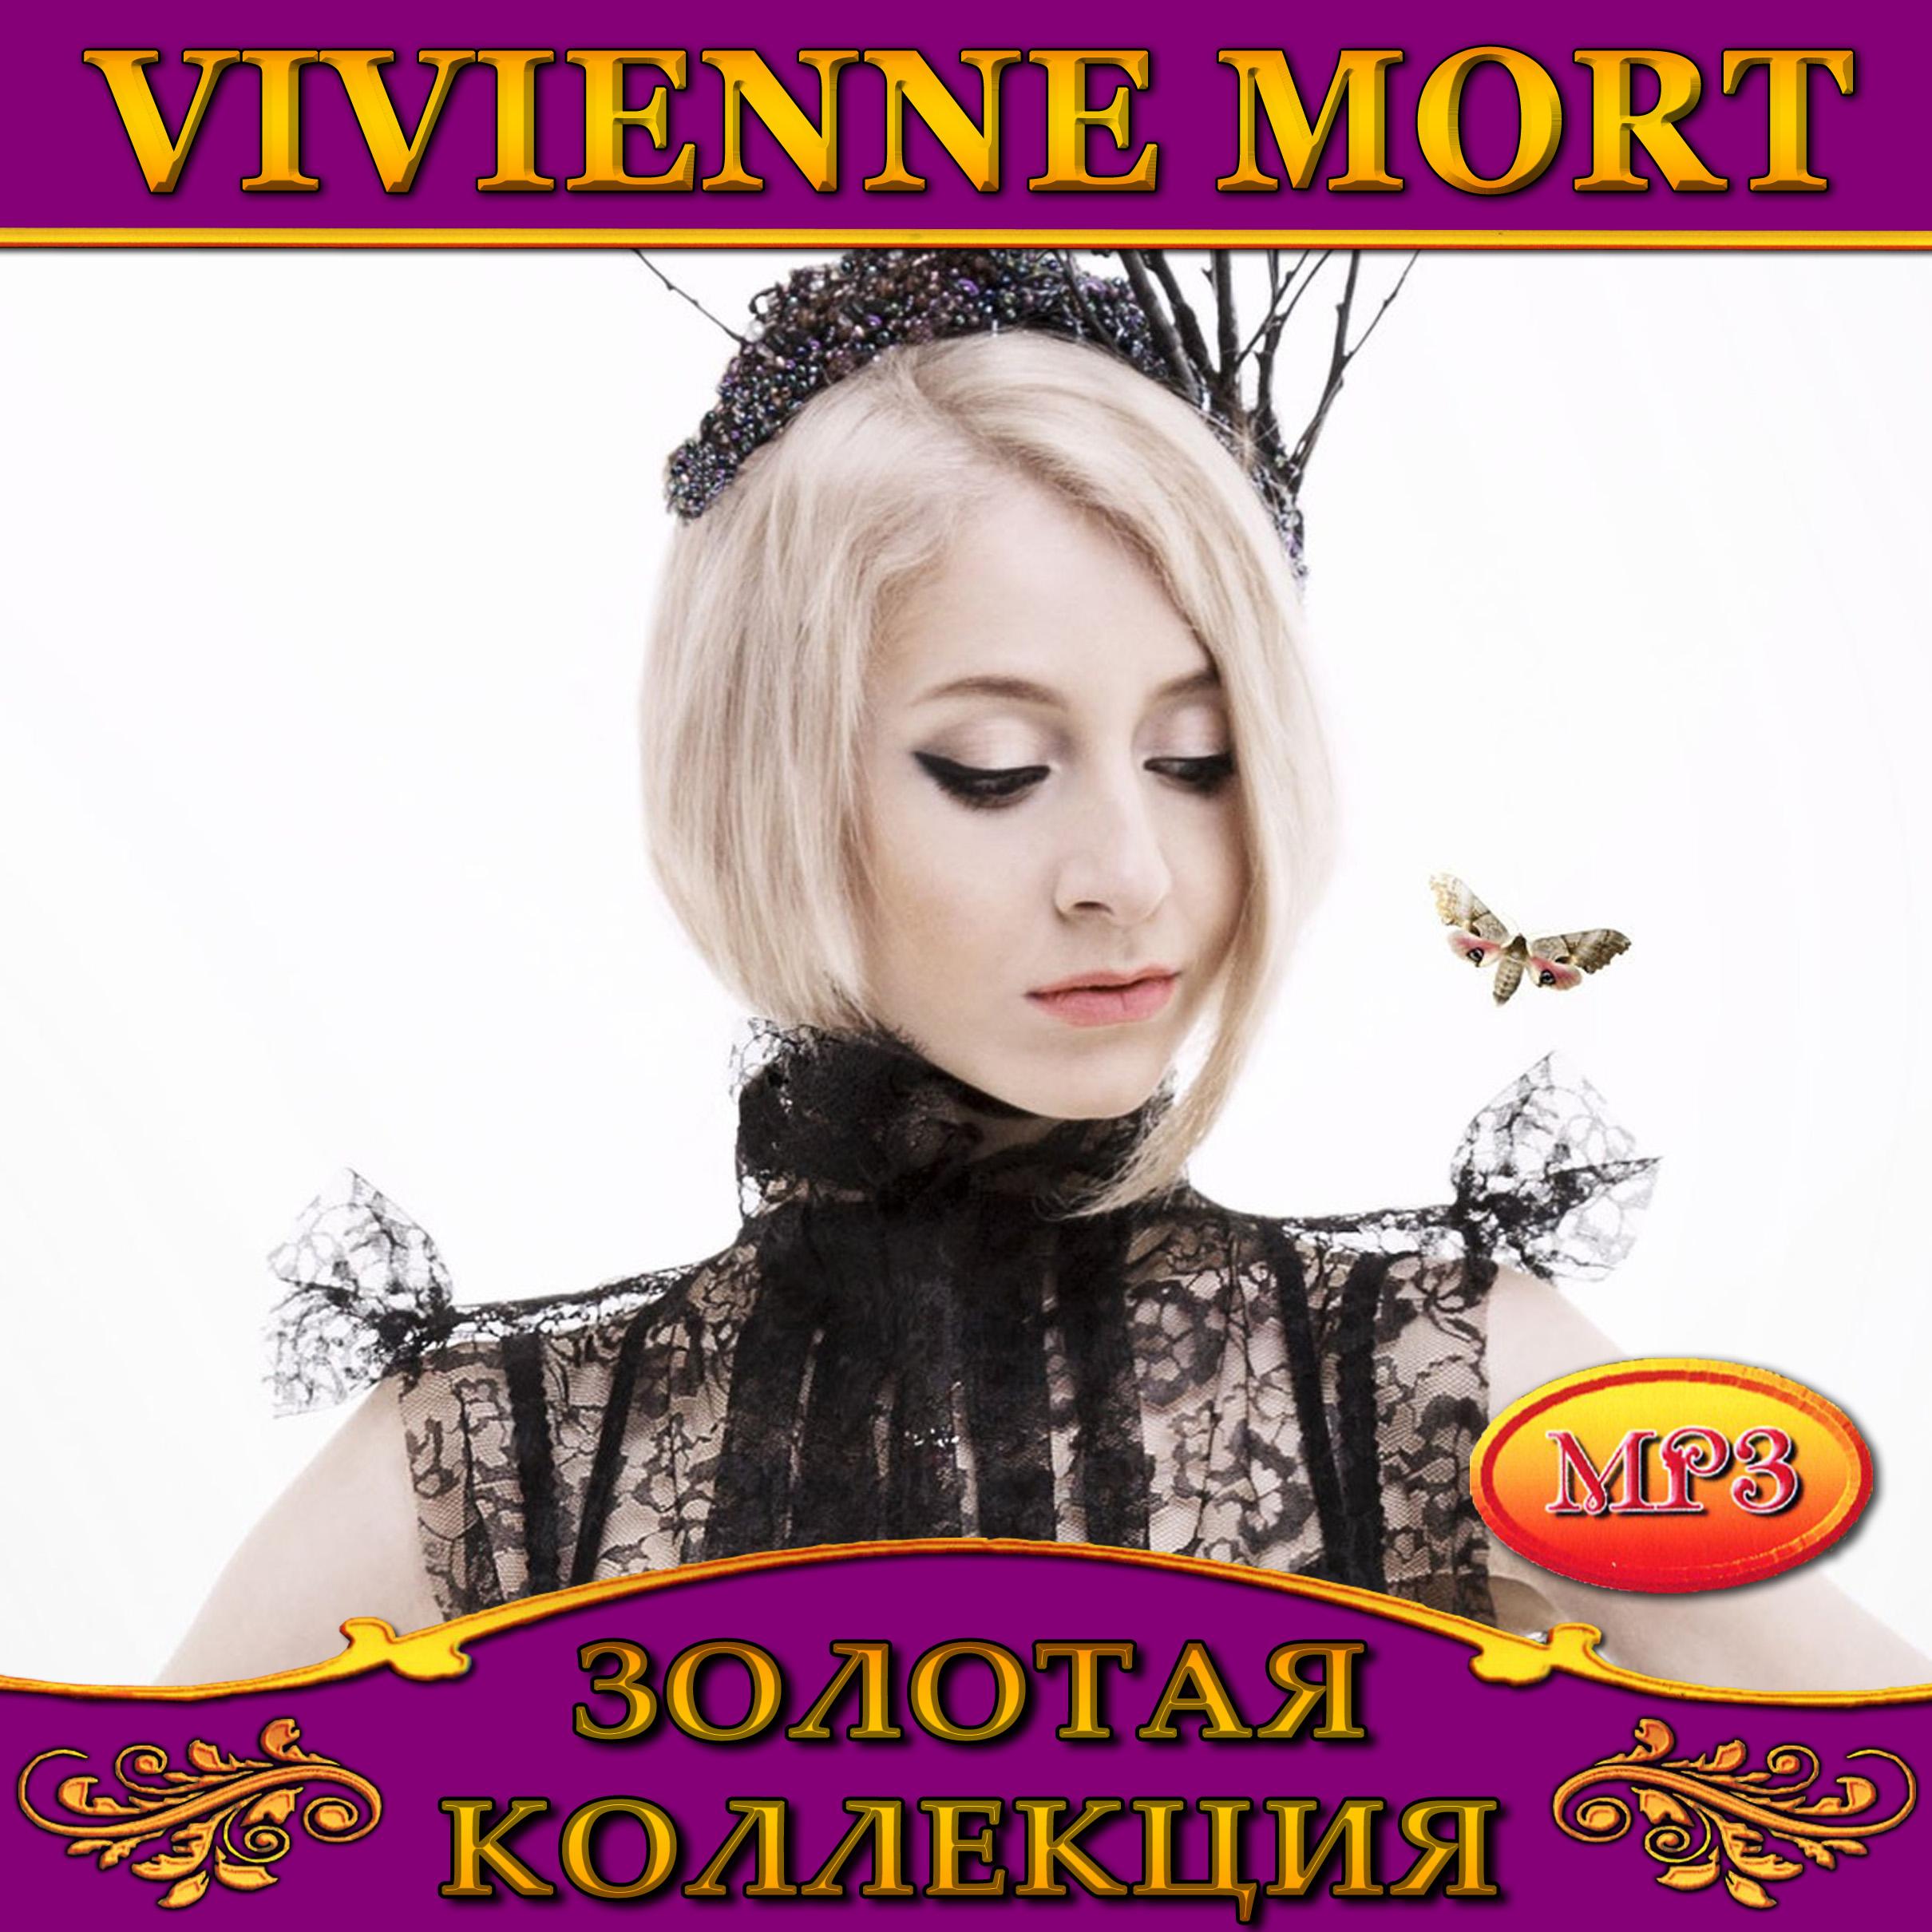 Vivienne Mort [mp3]